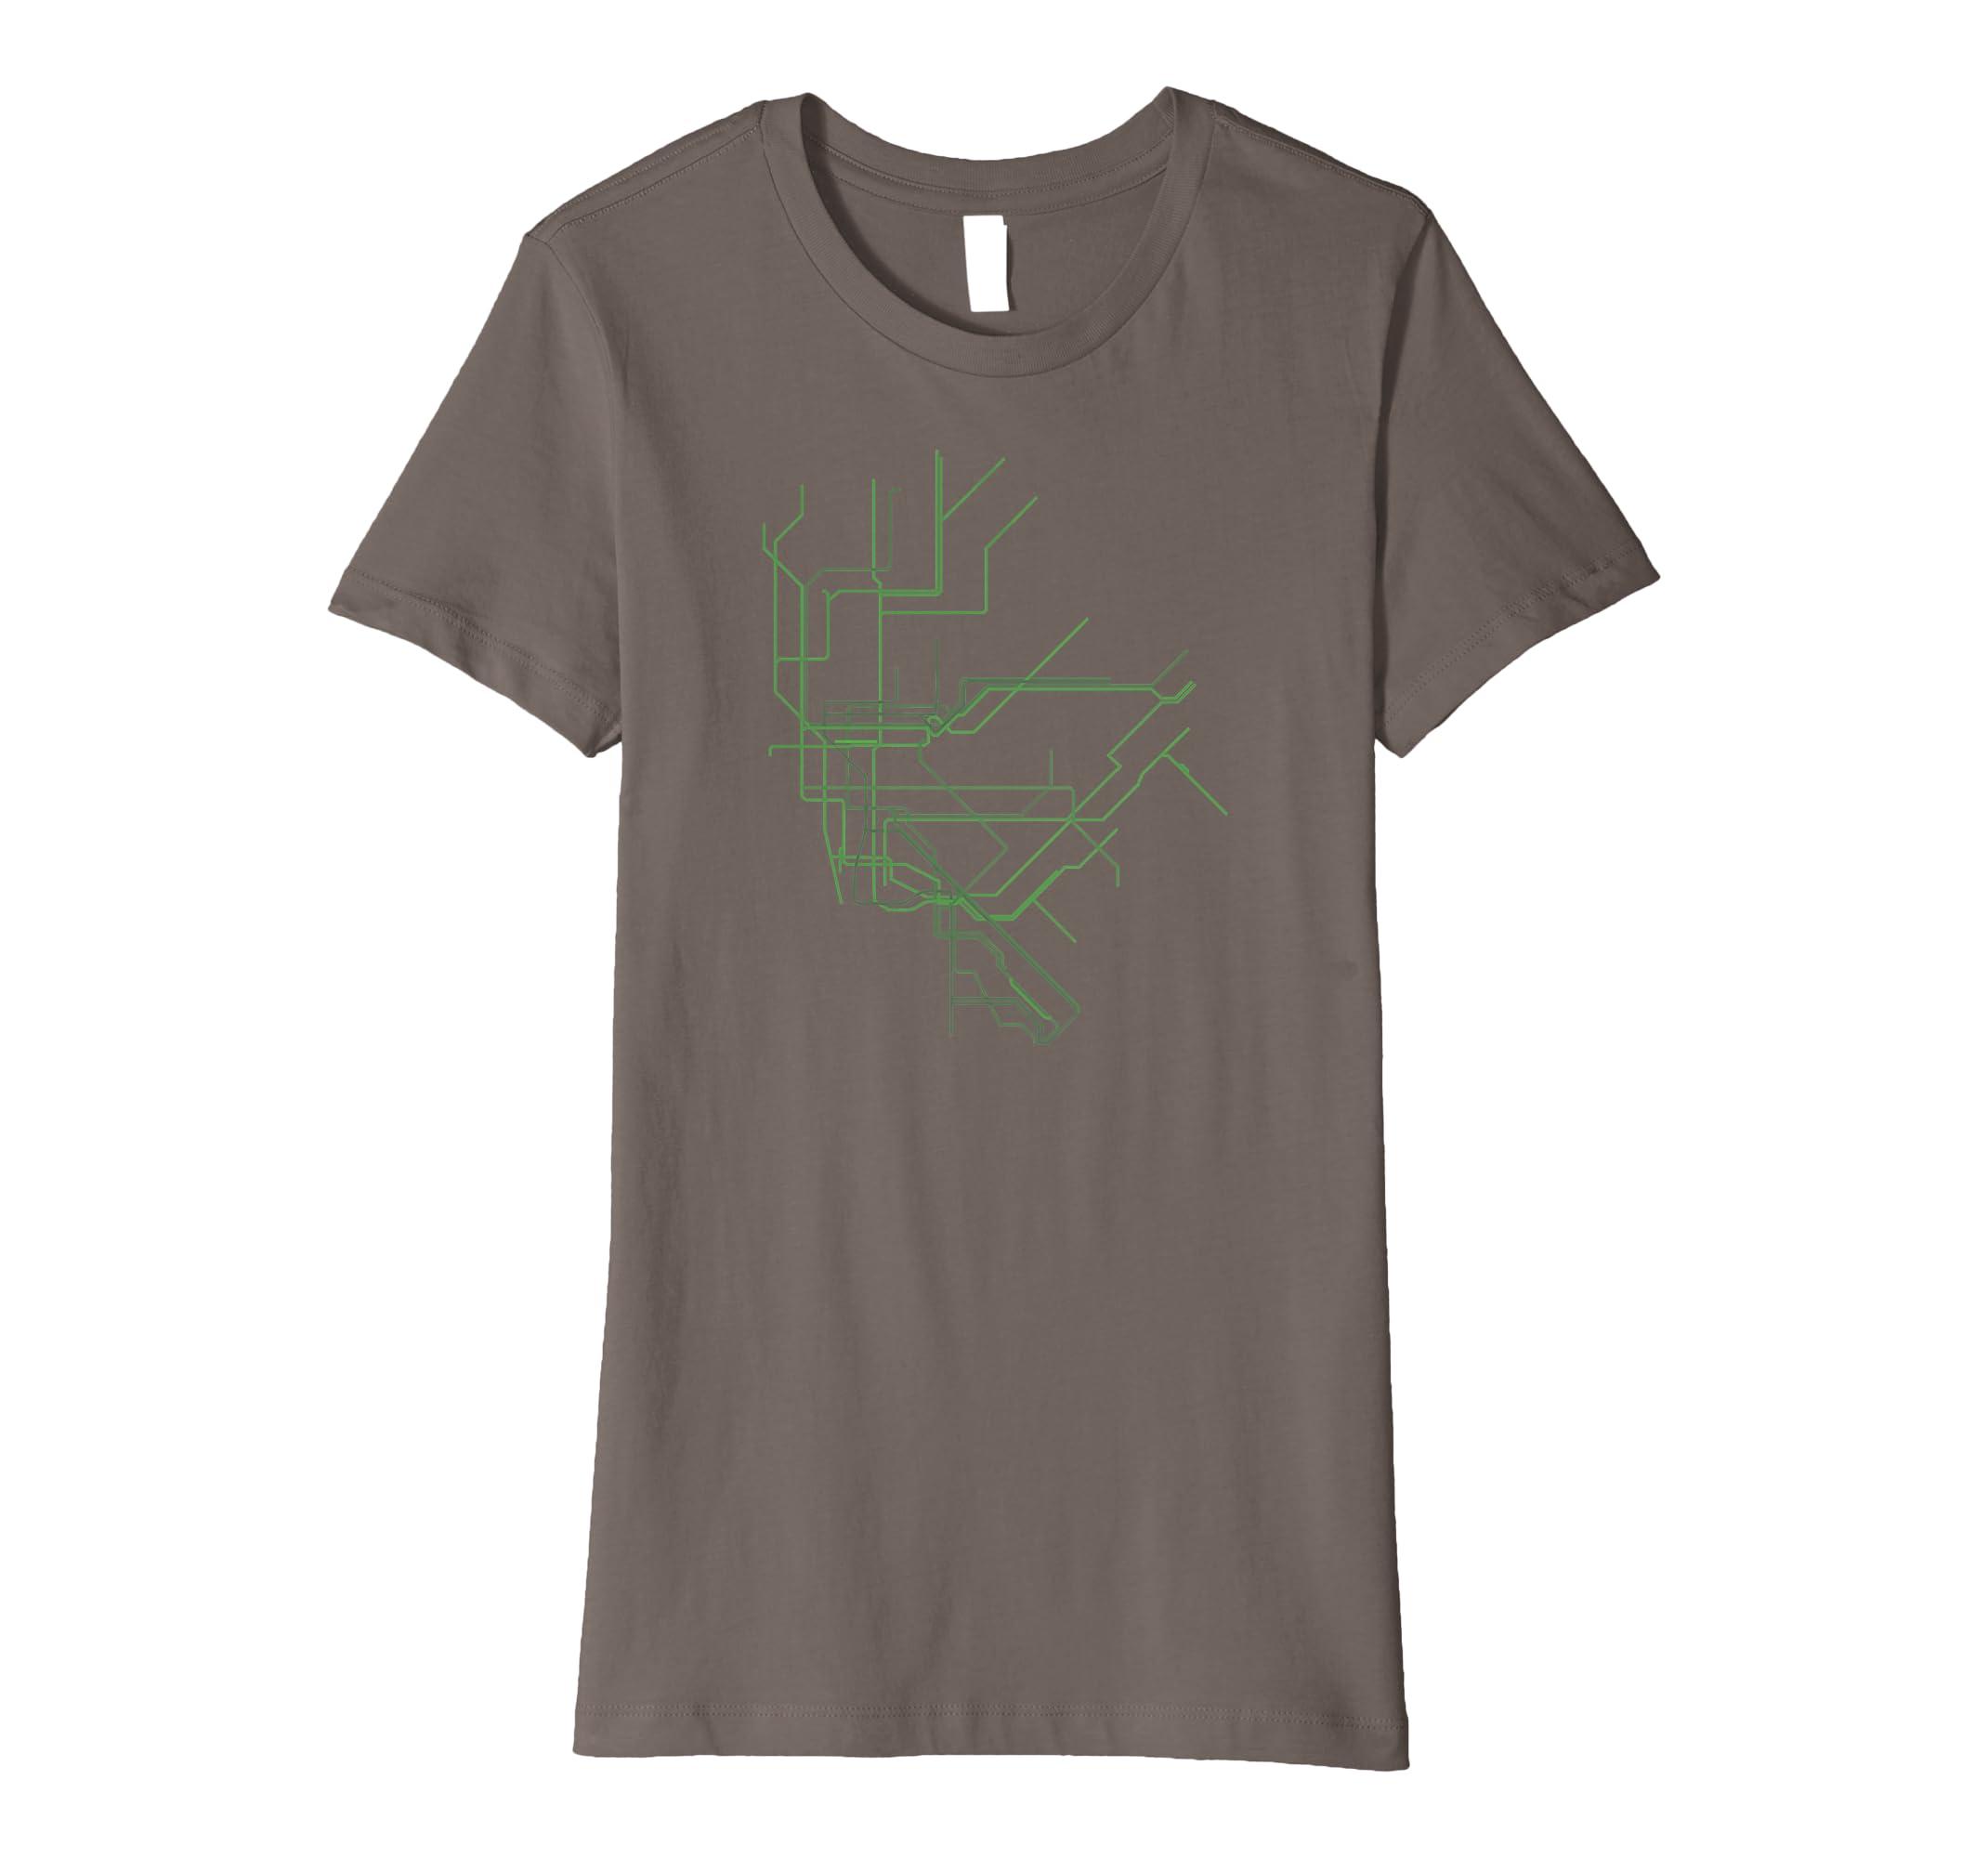 Amazon.com  New York City NYC Subway Map Line Art Shirt  Clothing 4ef2391ce69